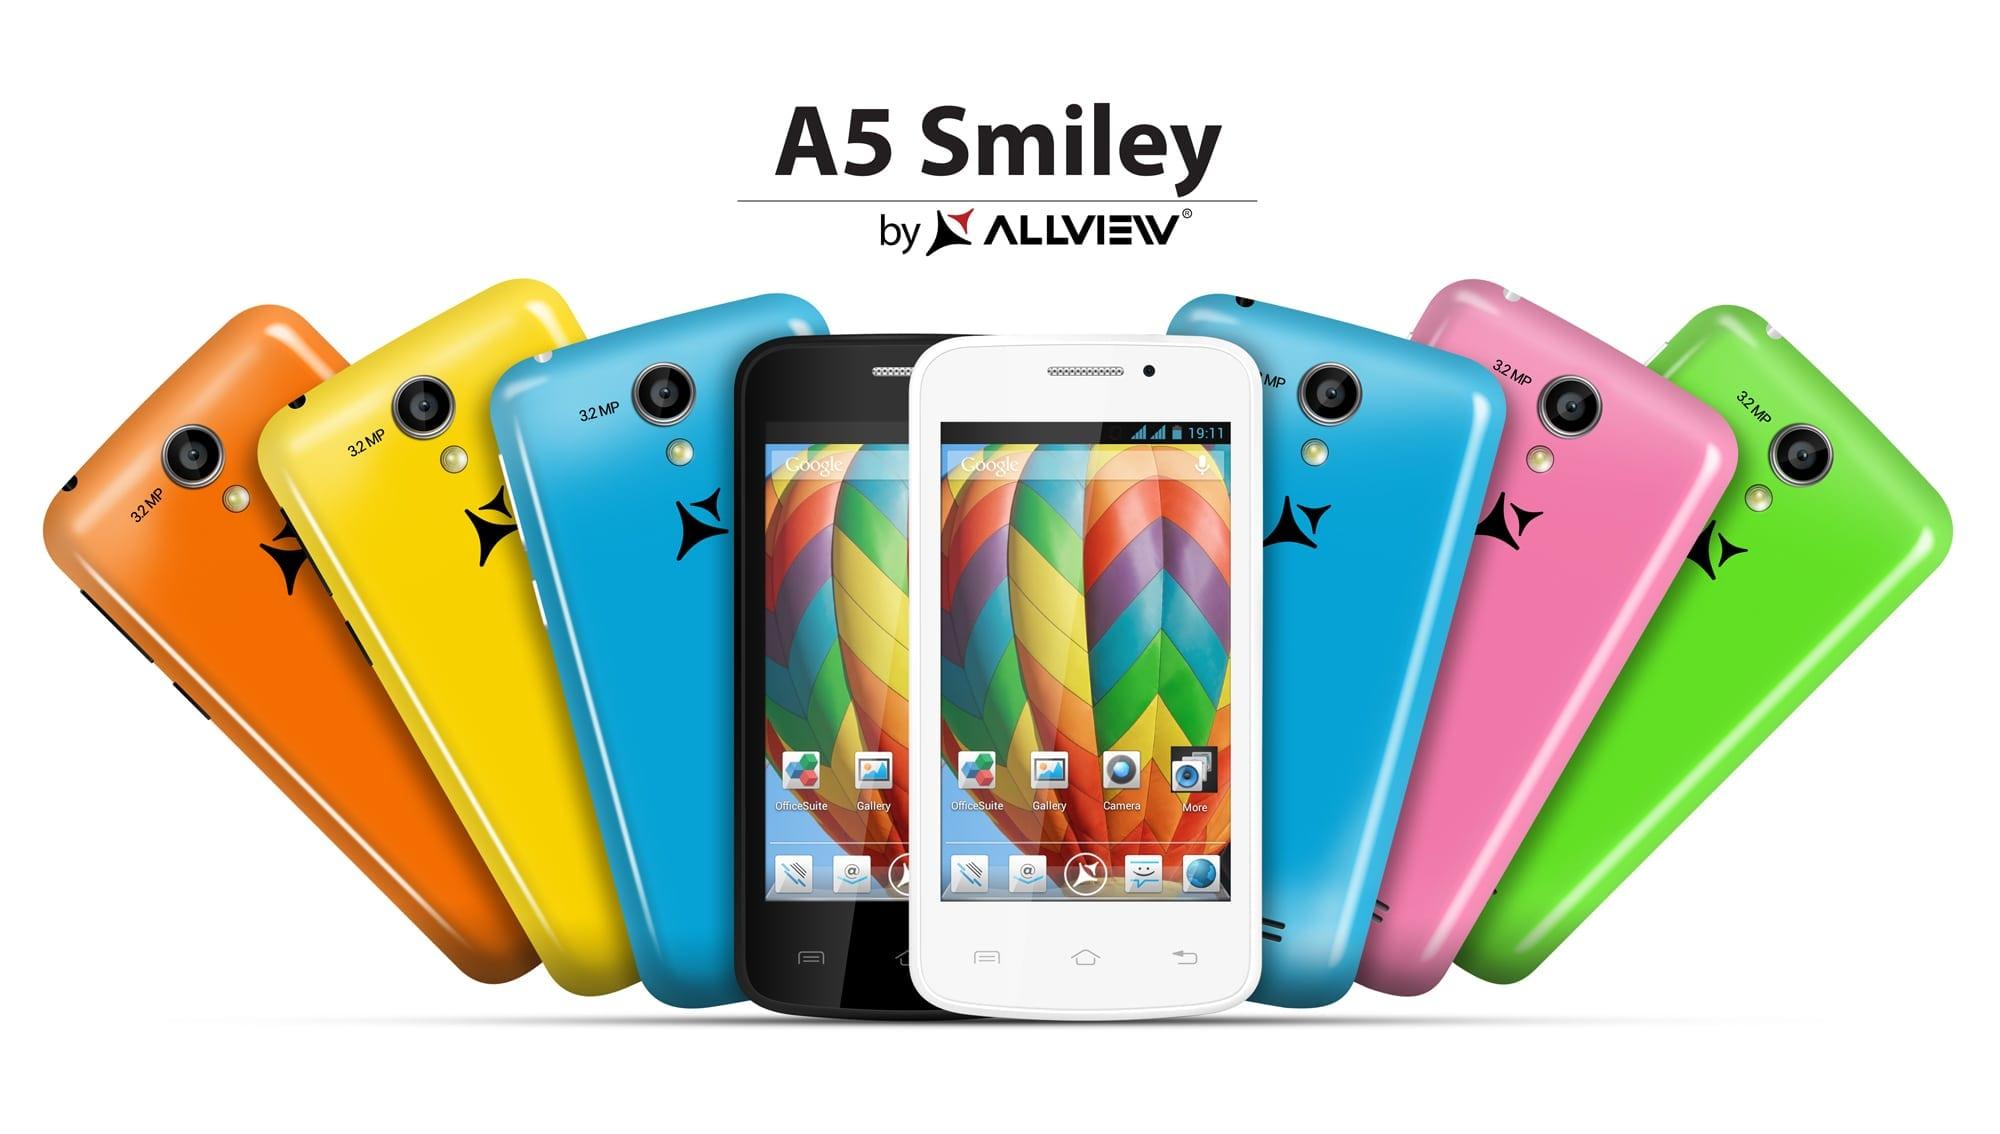 a5-smiley-Allview1